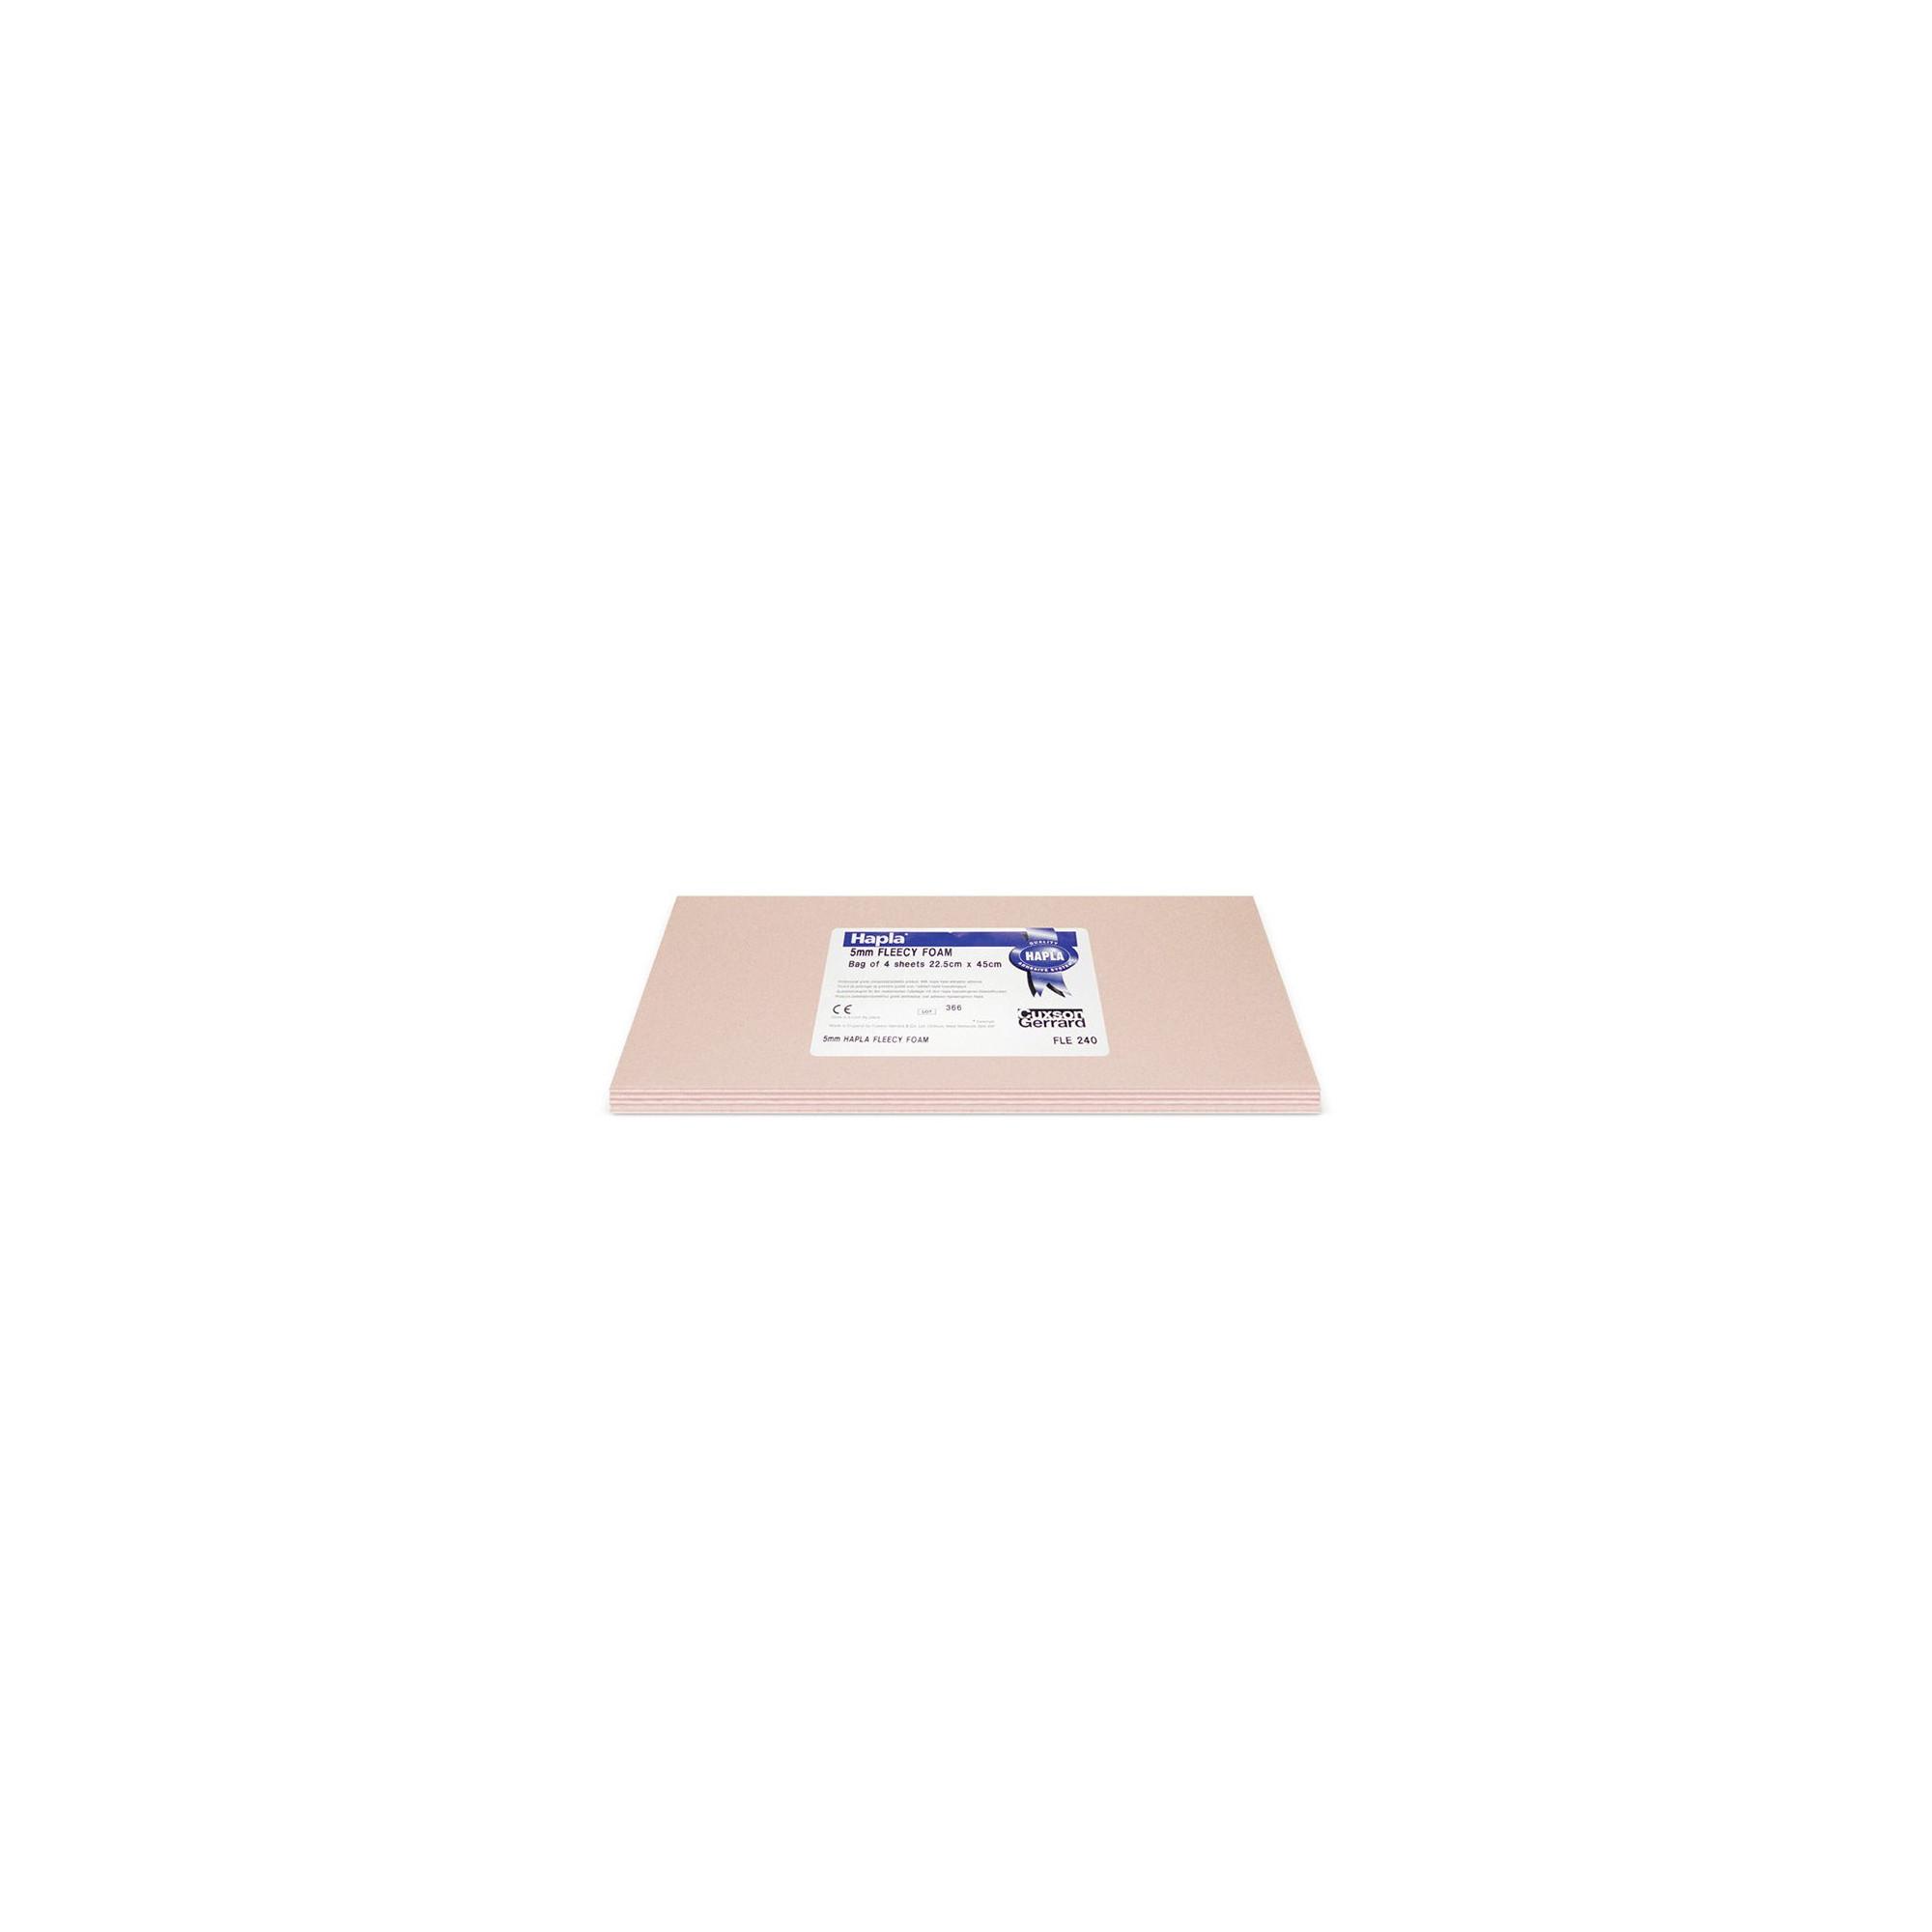 Hapla Fleecy Foam - Plaque de Bandage adhésif